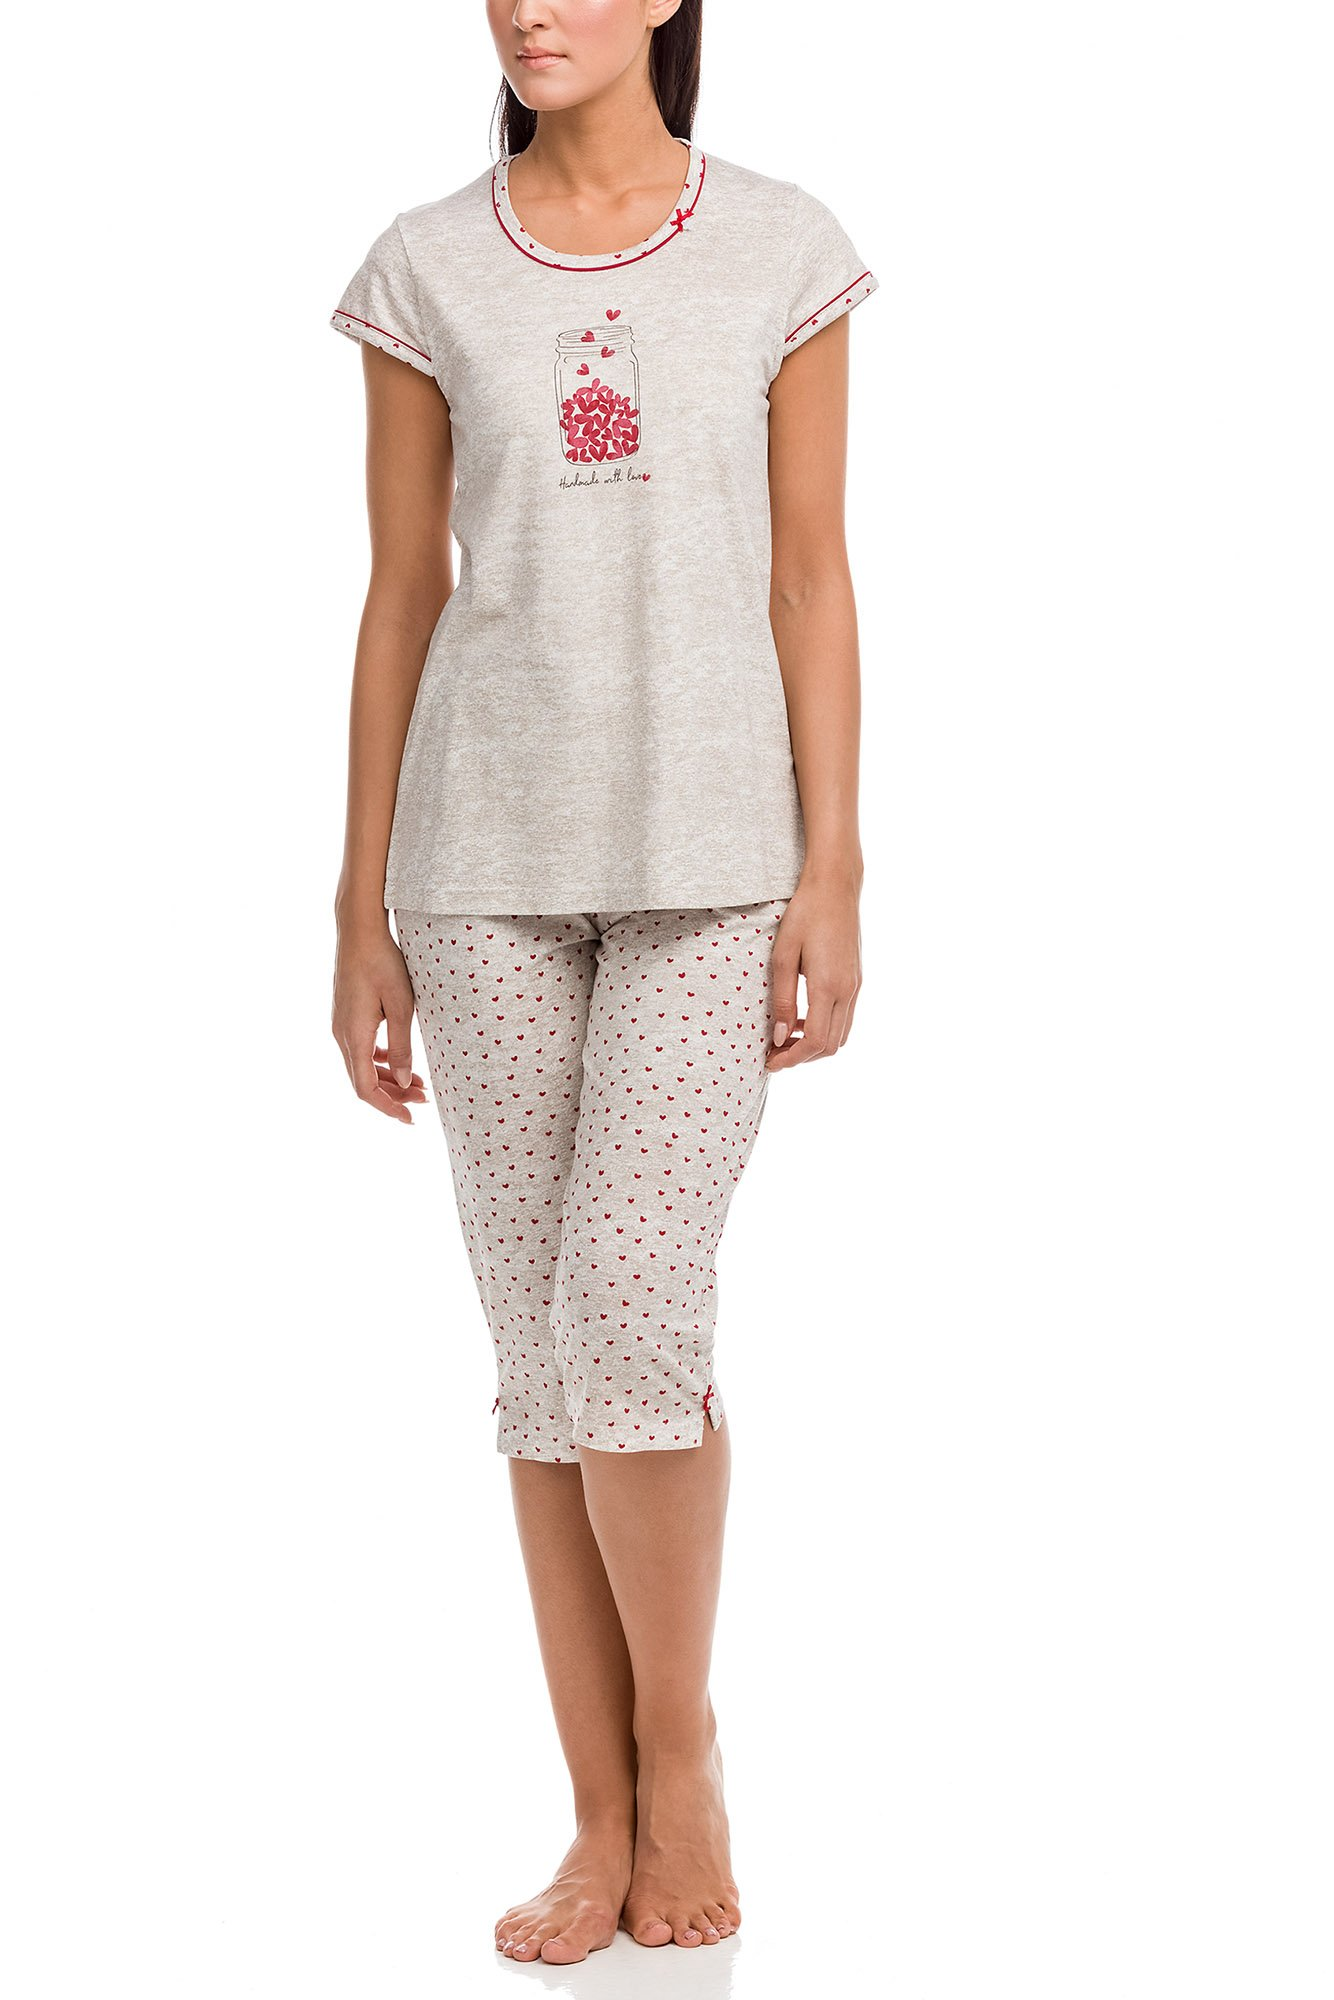 Vamp - Dámske pyžamo 12100 - Vamp beige m